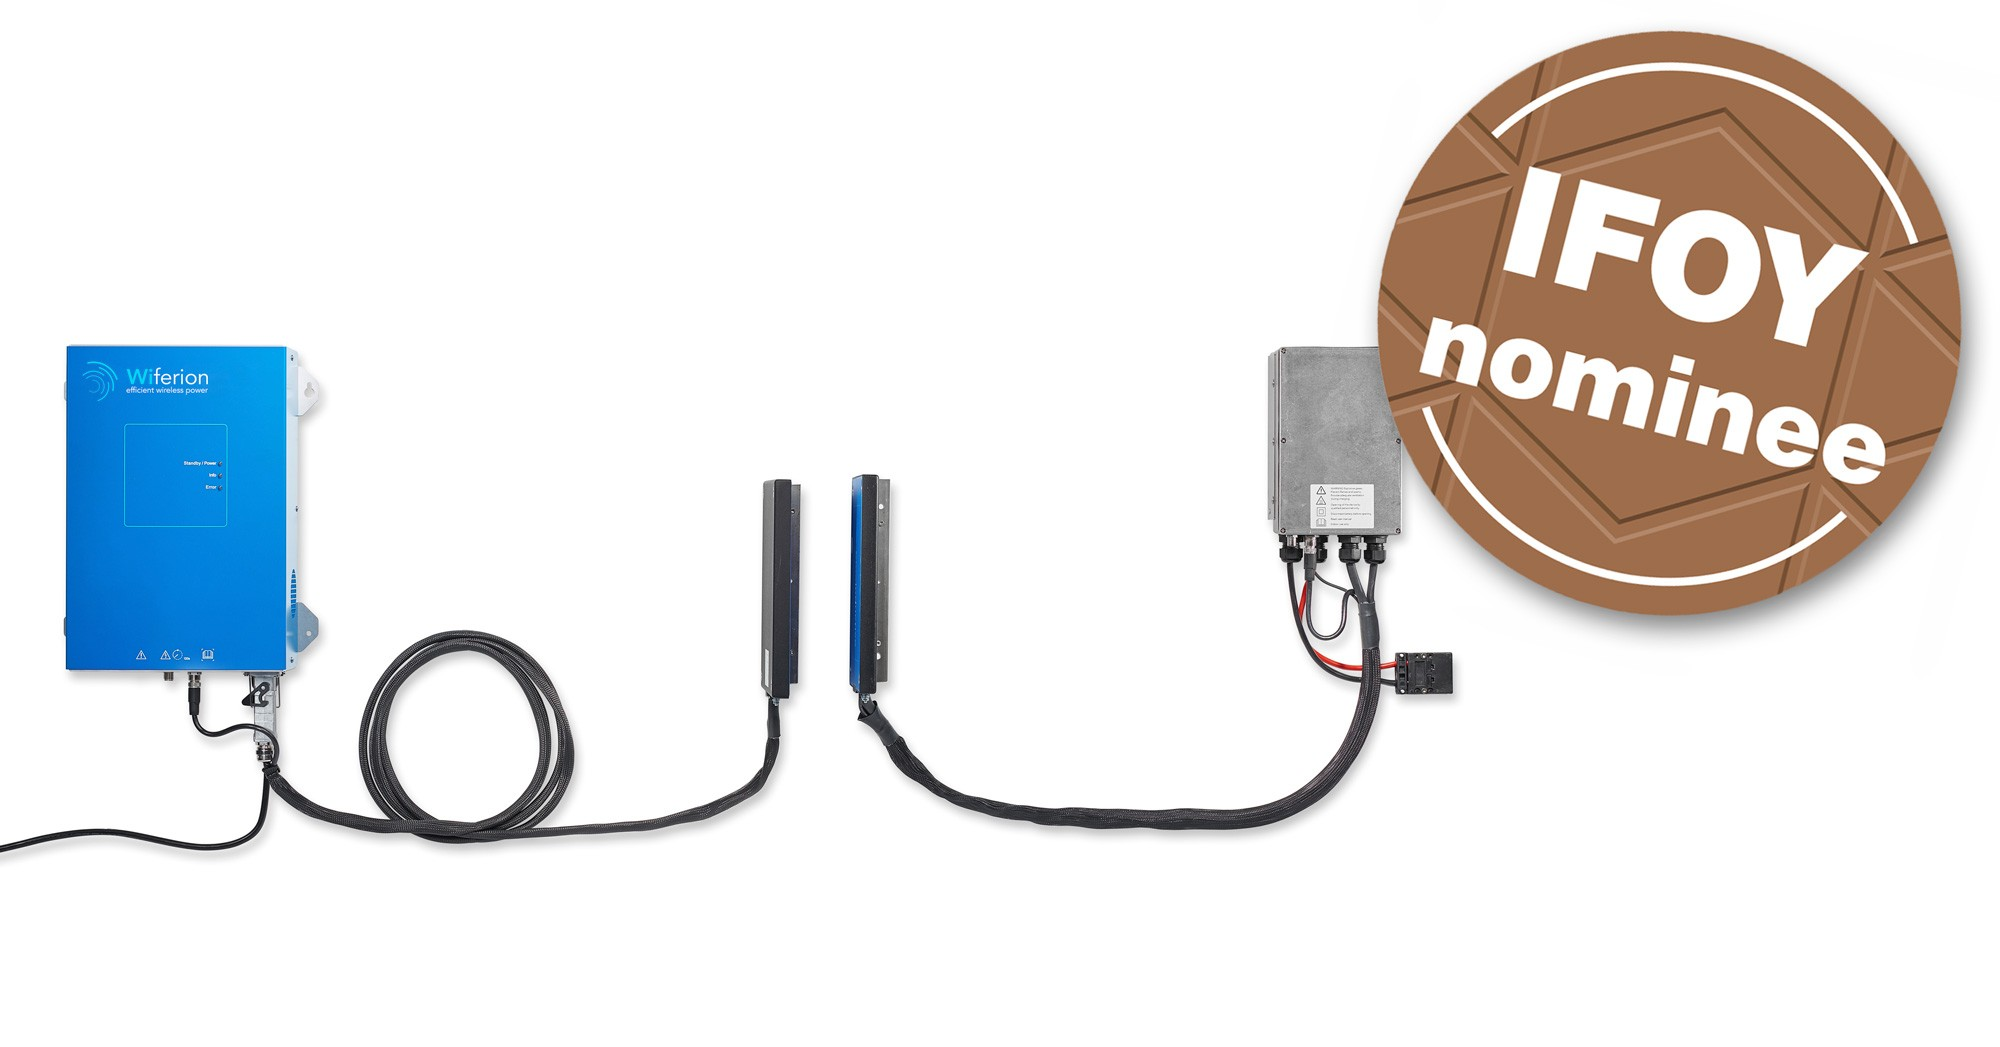 etalink 3000 - Wiferion - inductive_charging_wireless efficient power - IFOY award 2020